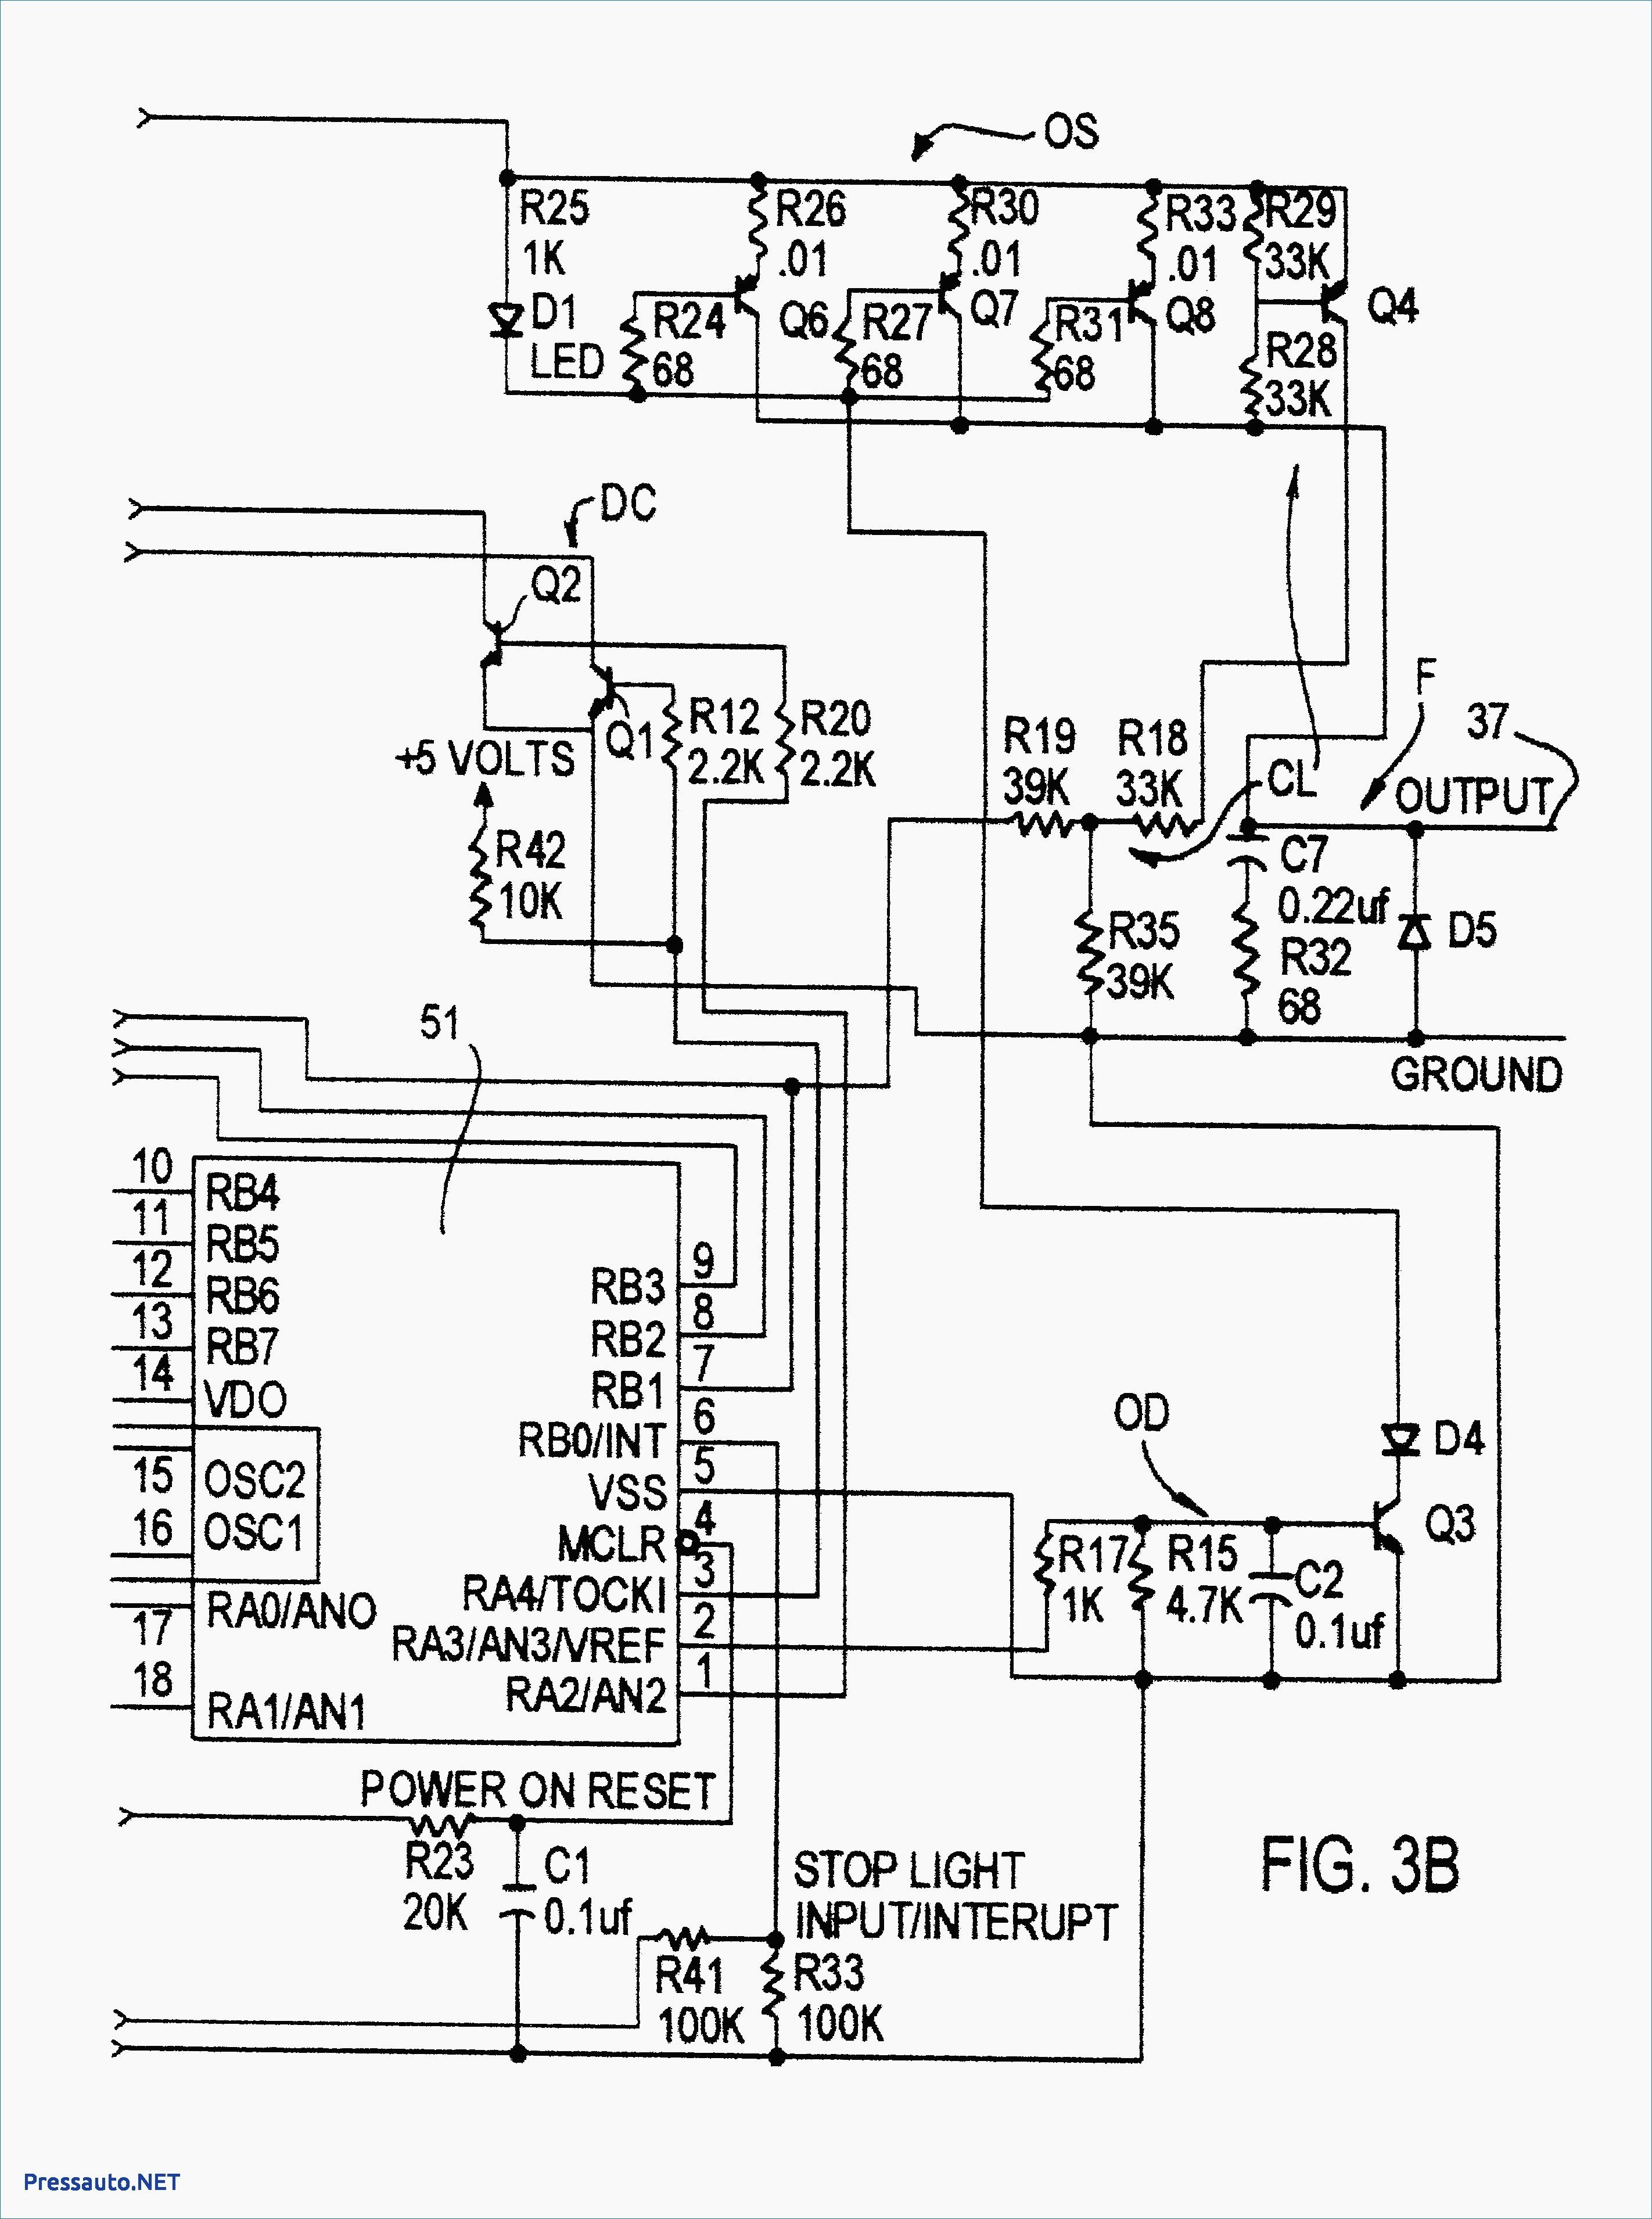 208v 3 Phase Motor Wiring Diagram Auto Diagrams Stove Wiring Diagram 220v Auto Diagrams Instructions